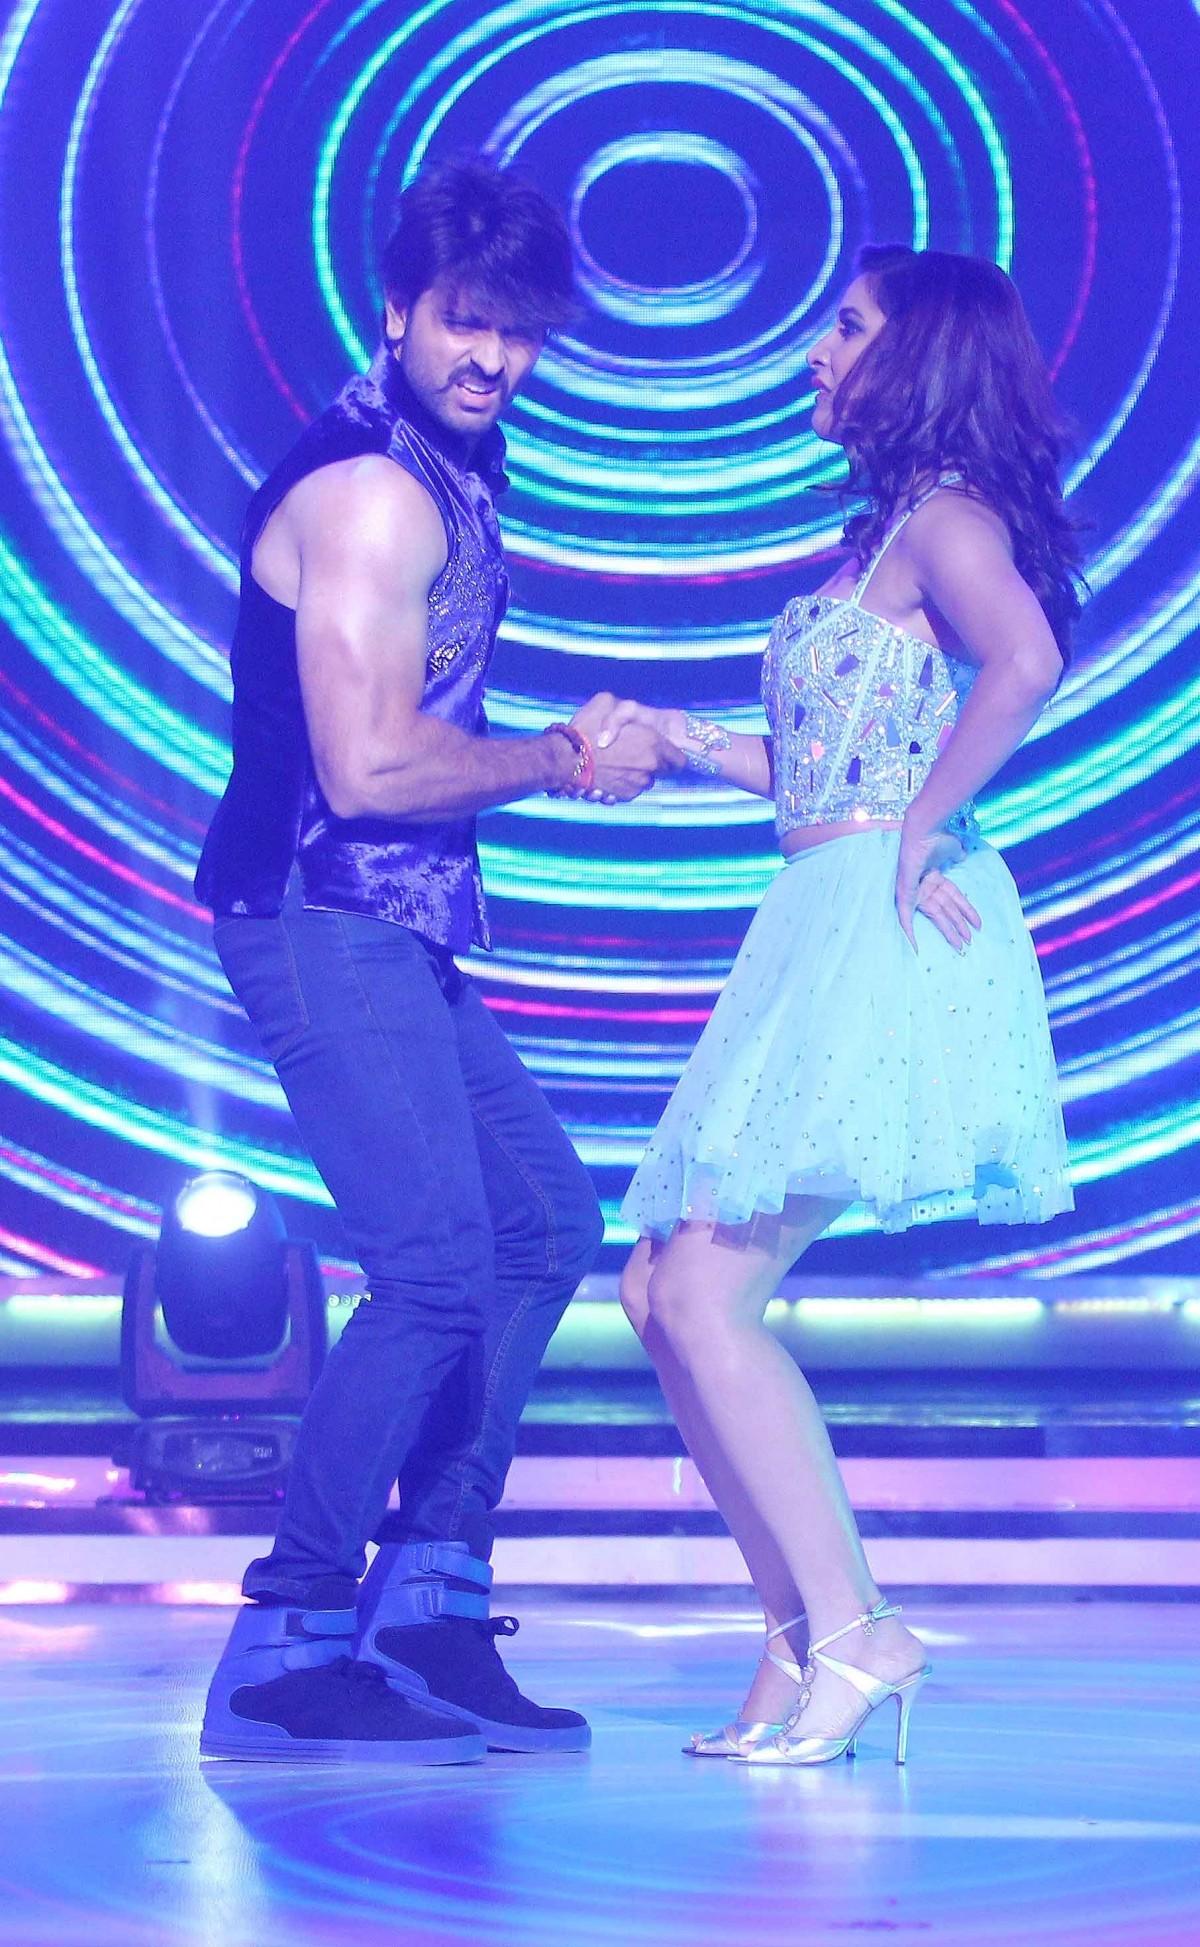 'Jhalak Dikhhla Jaa' Season 7 Winner Ashish Sharma Says, 'I Thought I Will Be Out in 2 Weeks'